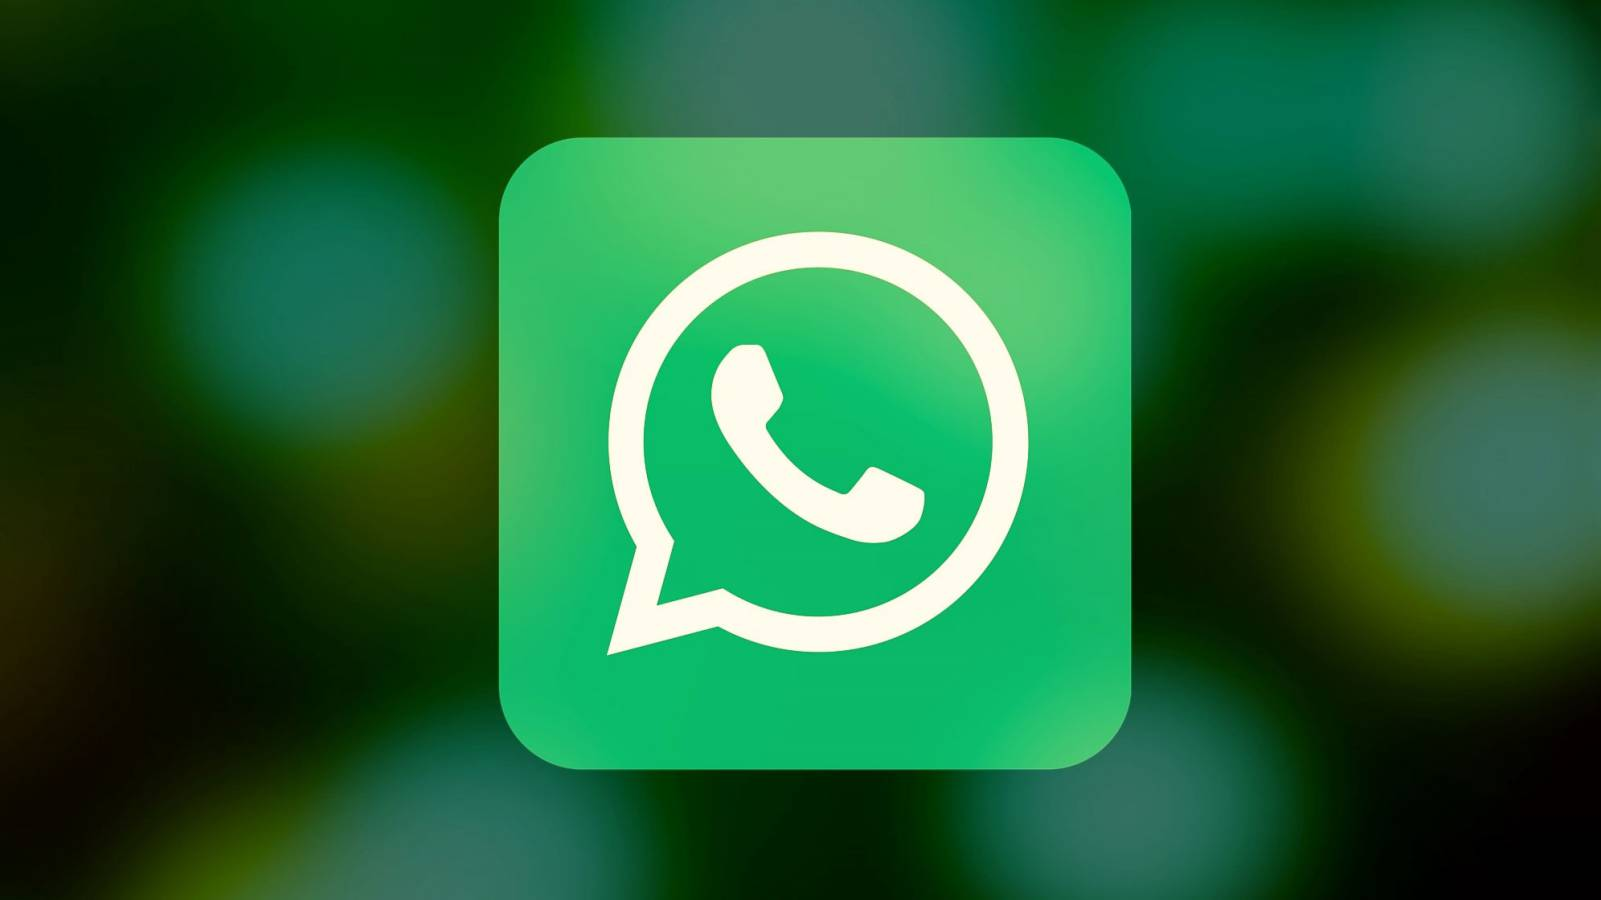 WhatsApp EXPLOATATA de catre POLITIE, Decizia Luata de Facebook